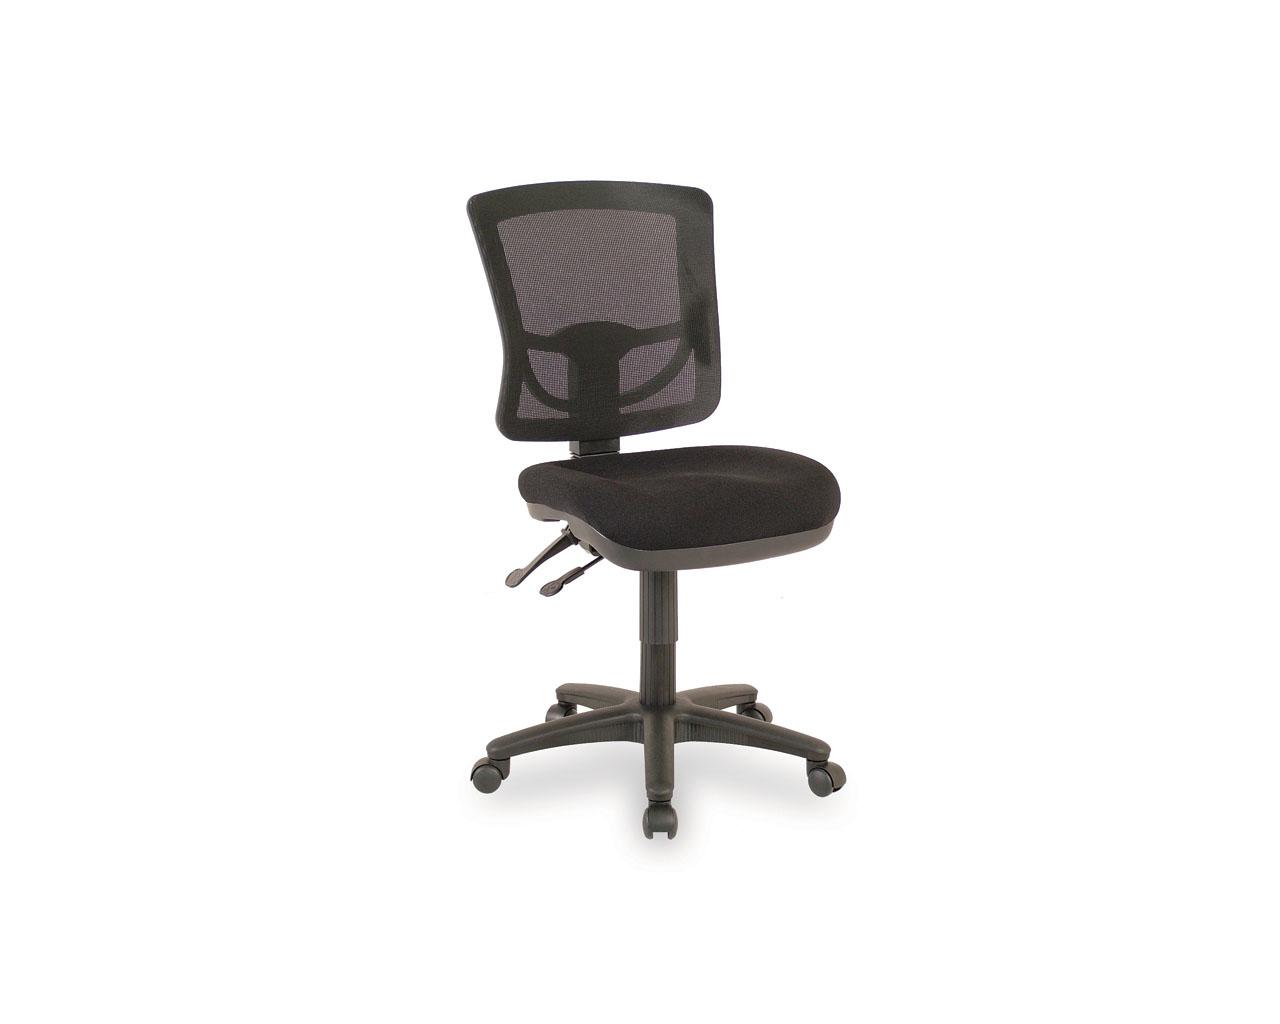 office chair toronto in pool chairs seating ergonomic desk lovan mesh task